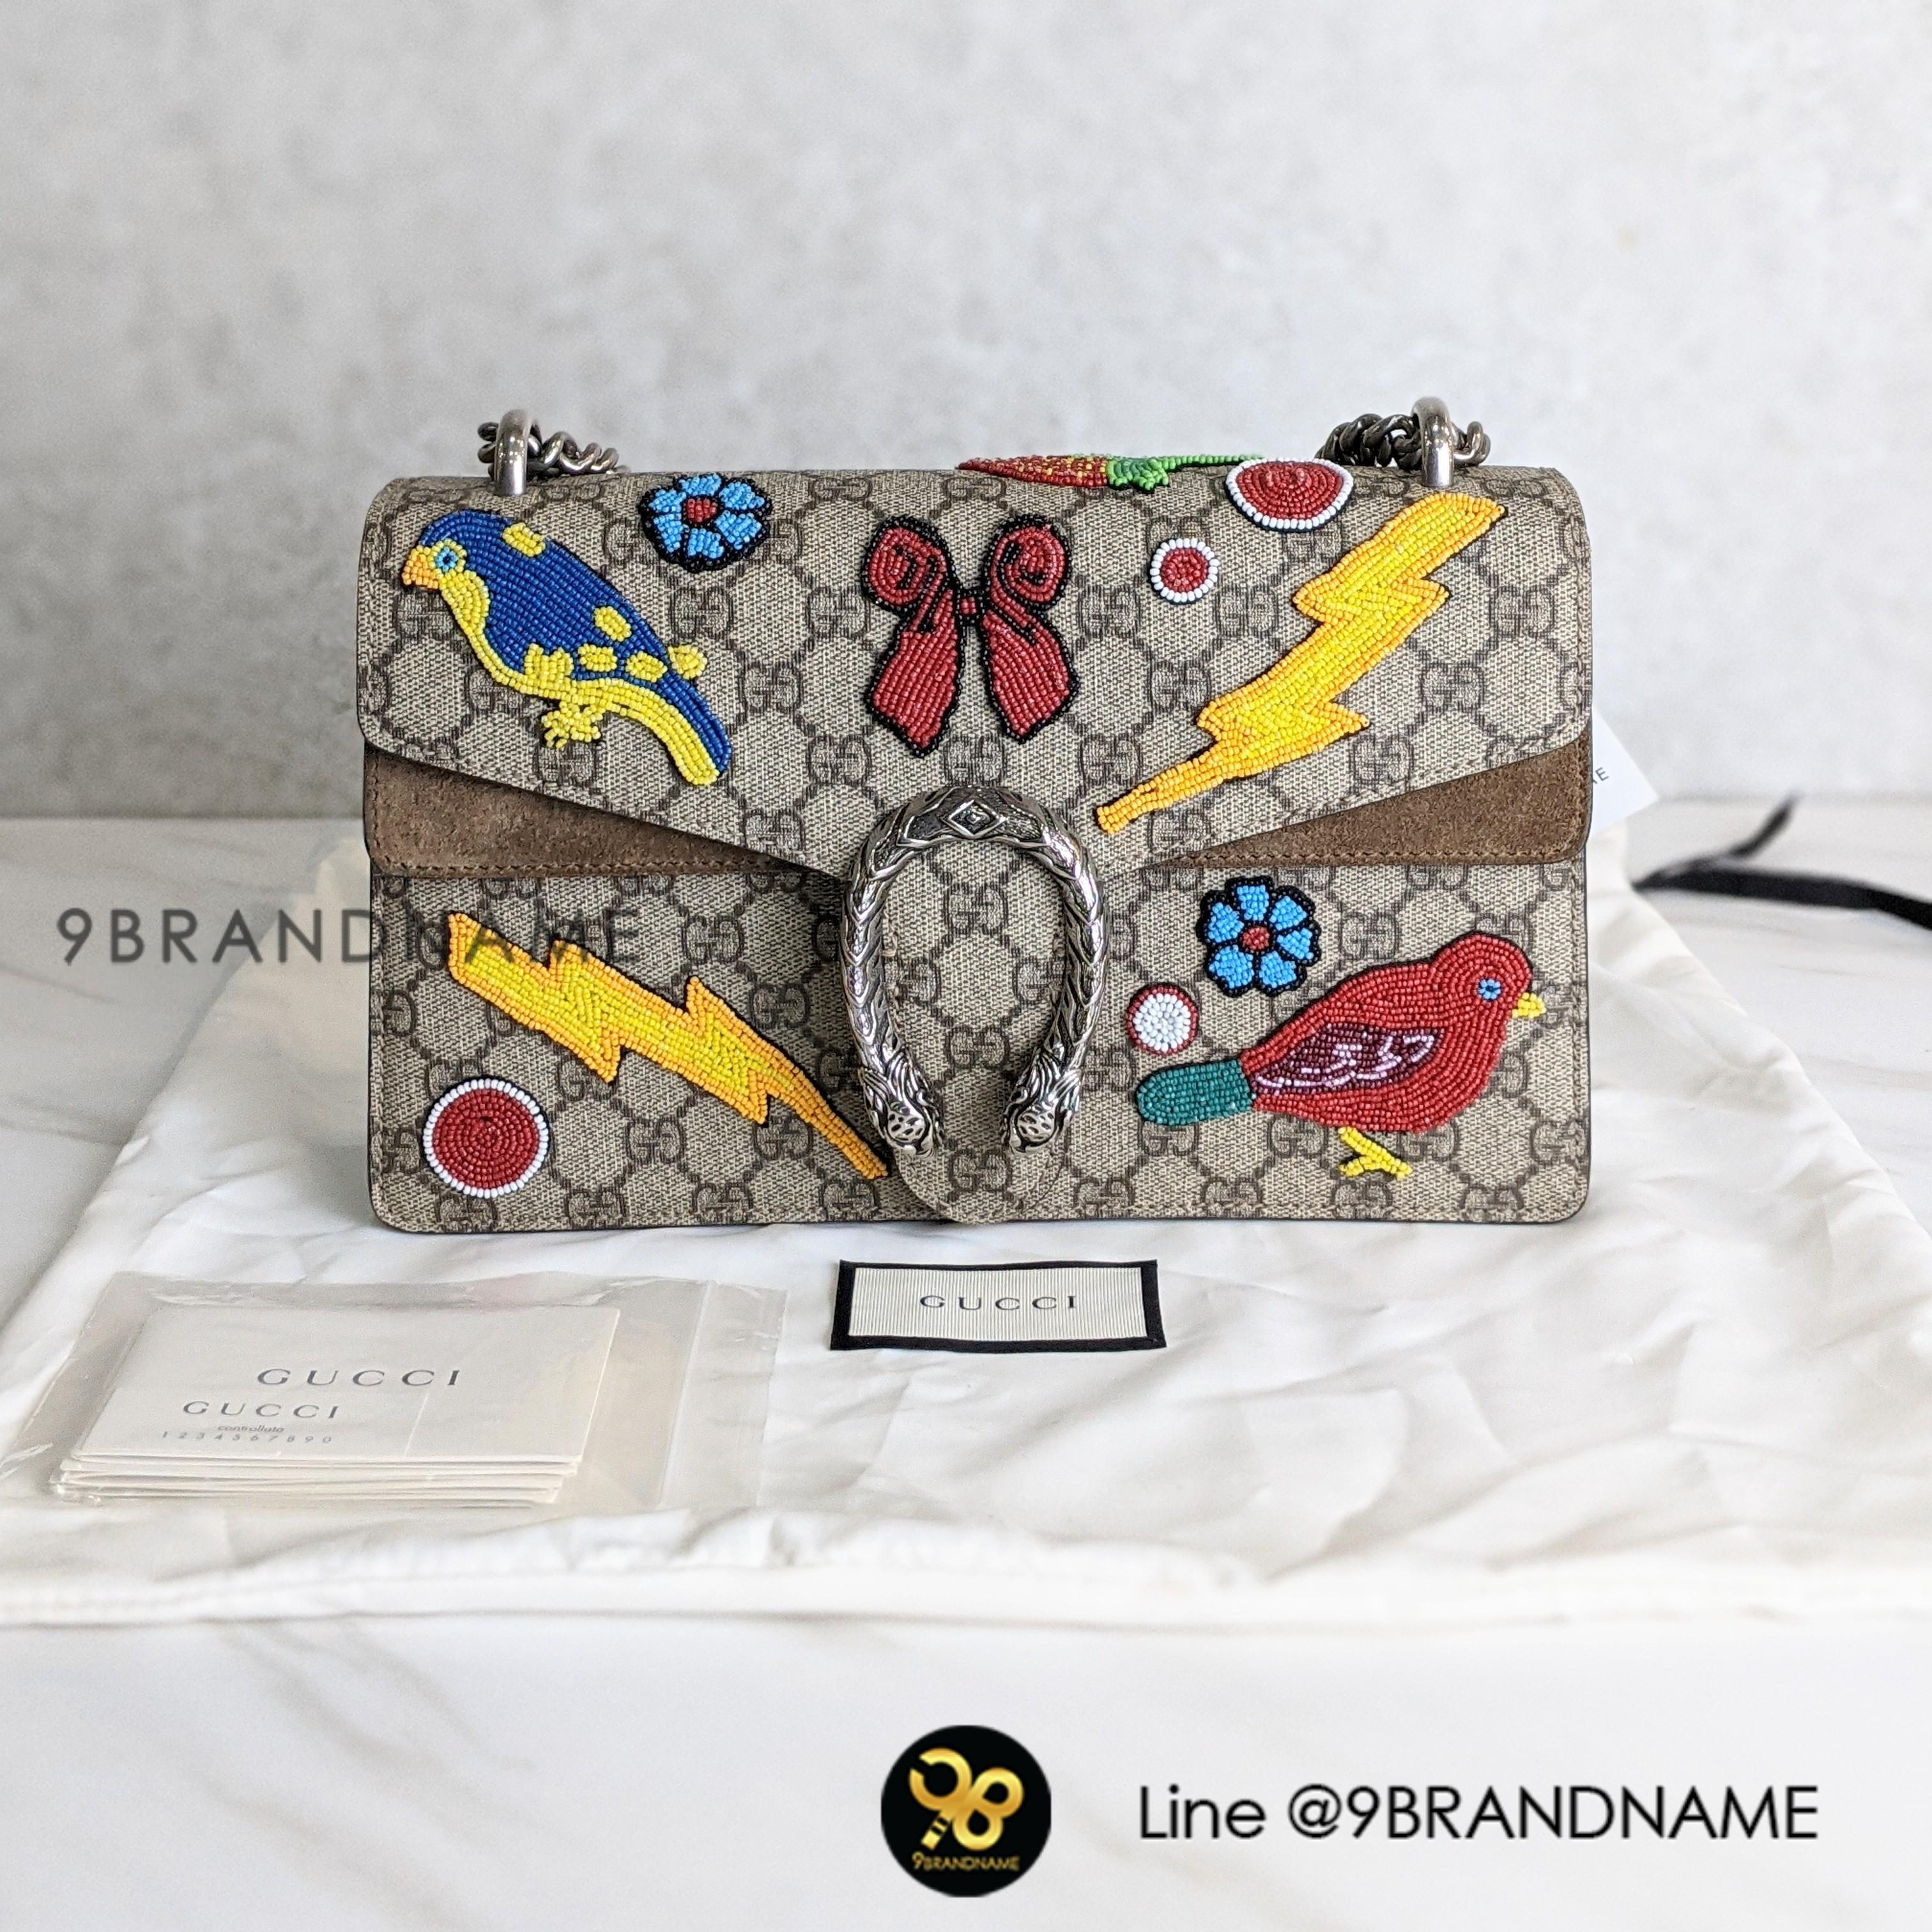 Used - Gucci Dionysus GG Supreme Coated Size : Small อุปกรณ์ : ถุงผ้า, คู่มือ,การ์ด Price : 49,900THB Shop Code : GC00448  เบอร์ร้าน : (+66) 0991564992 ผึ้ง : (+66) 0632491456 Line : @9brandname Location : Paradise Park ชั้น1 โซน O2 Webs